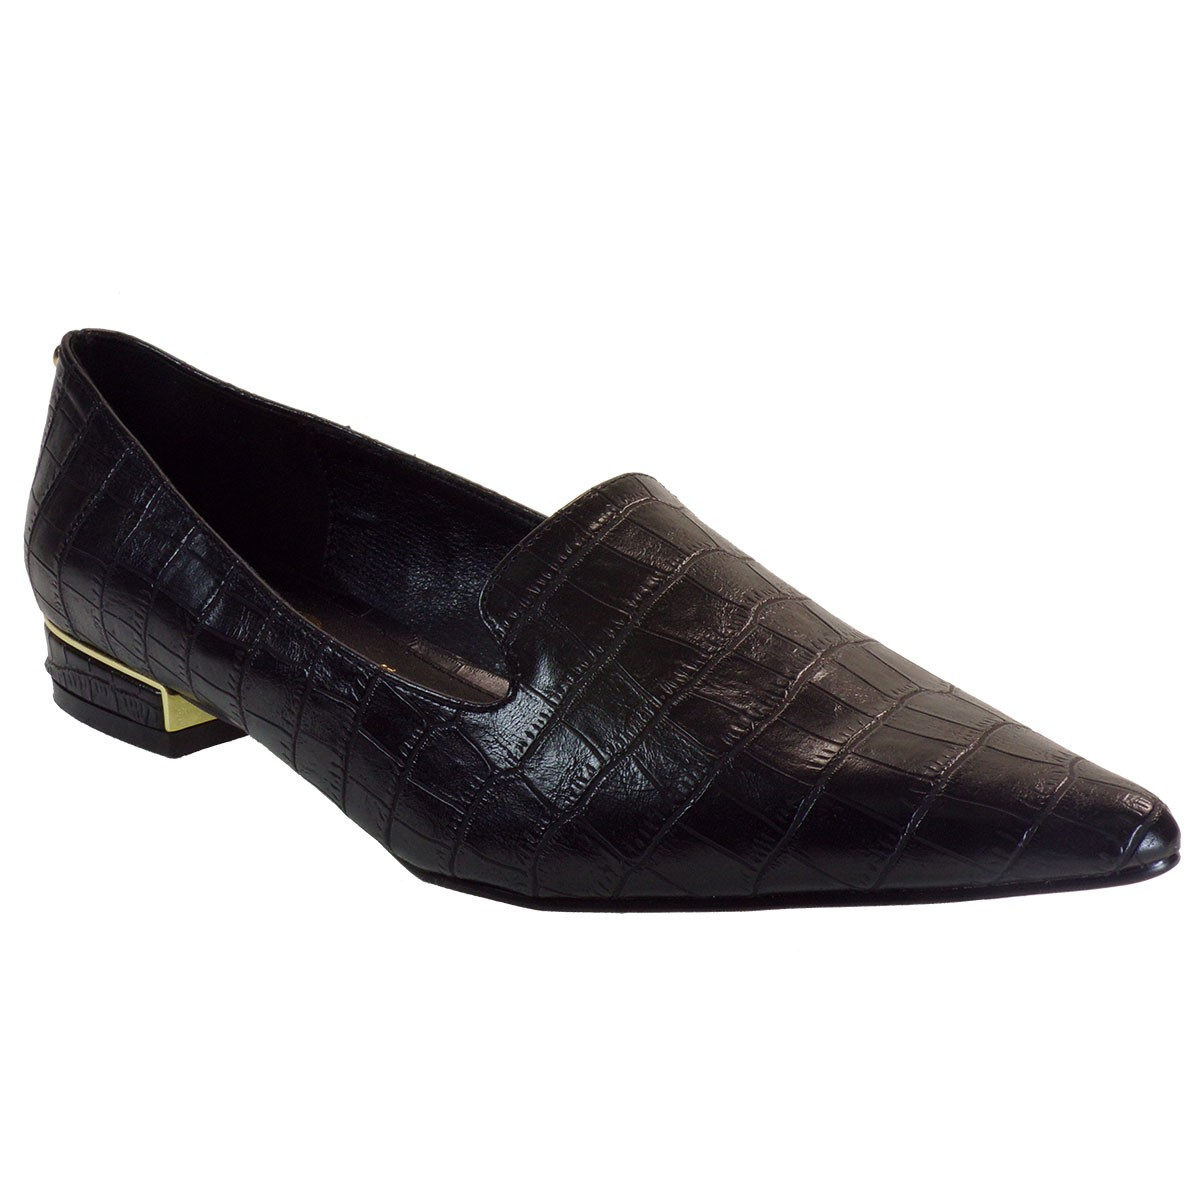 Exe Γυναικεία Παπούτσια LOAFERS 177 VERONA Μαύρο Κροκό L17001771024